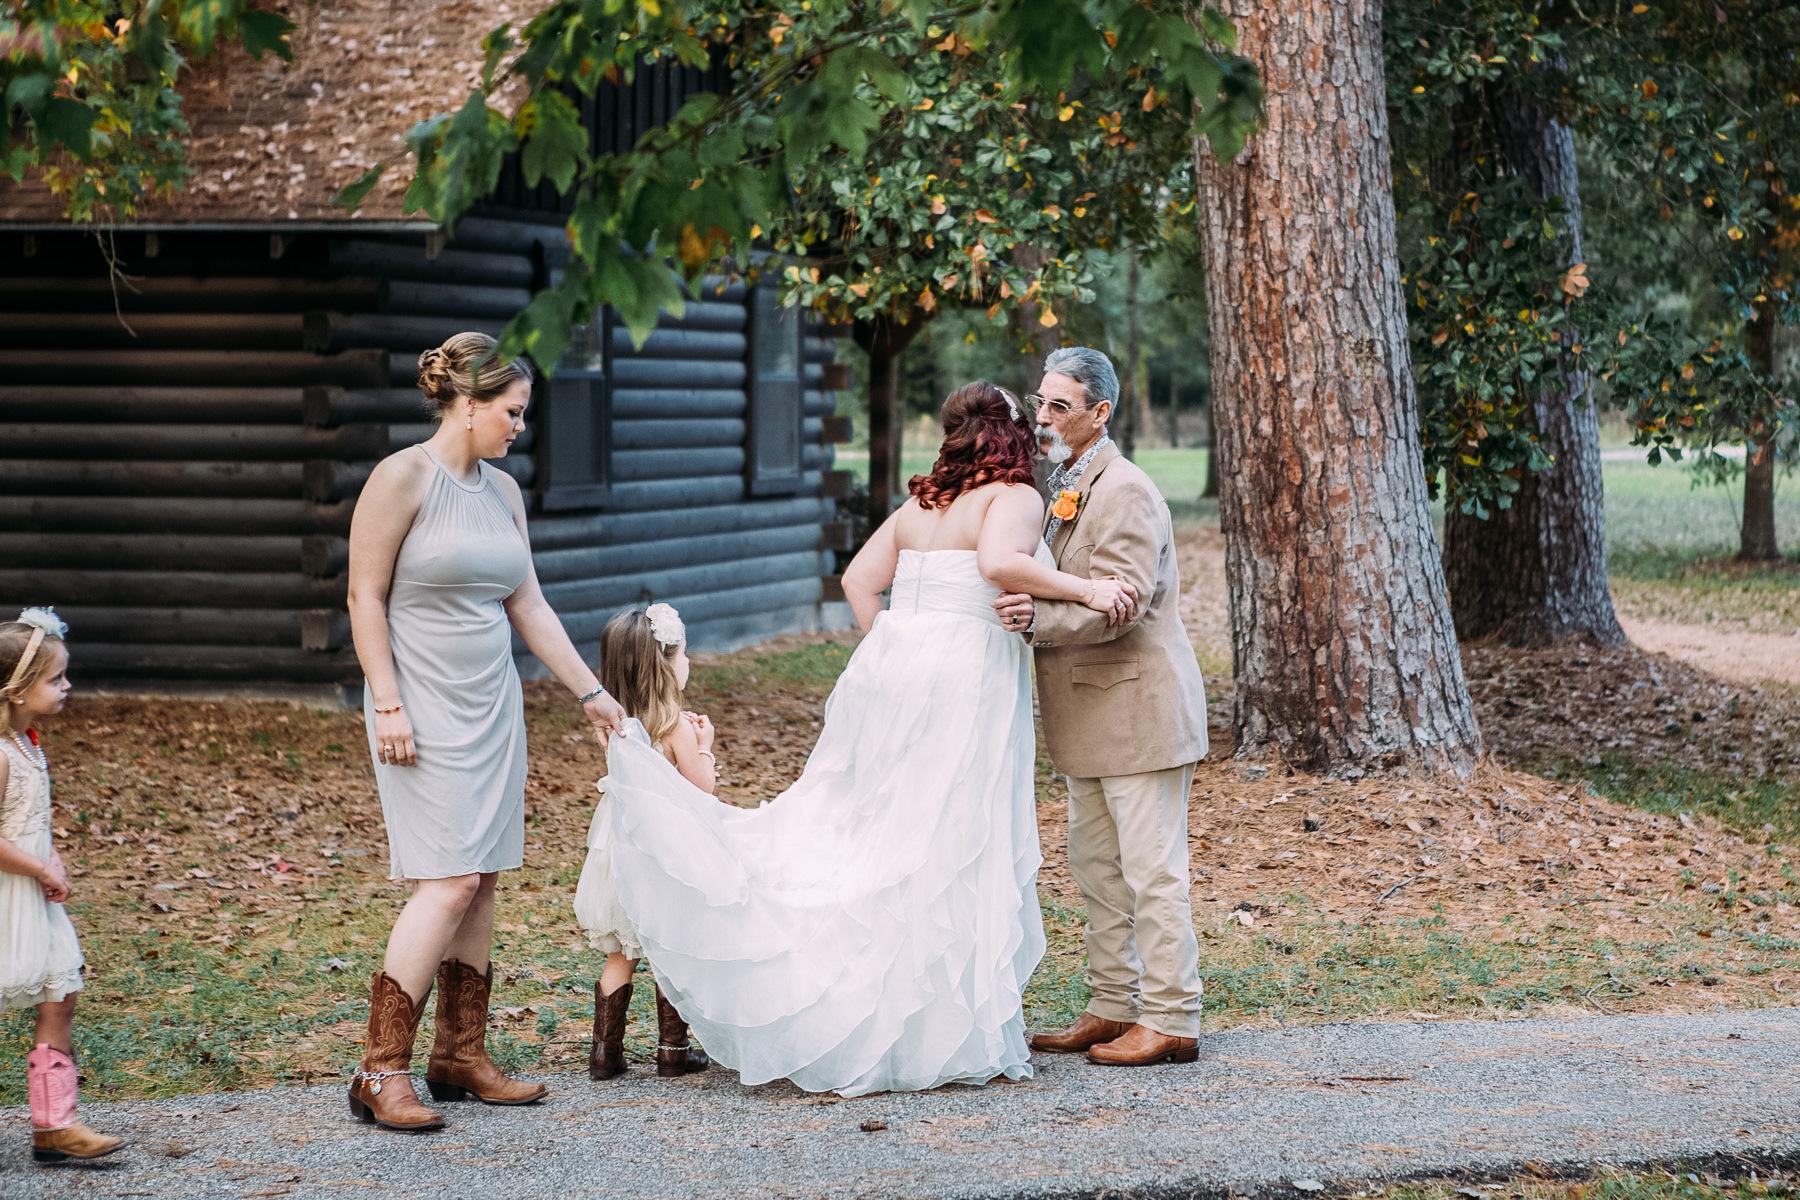 Documentary Wedding Photographer in Houston - Koehler Wedding-19.jpg